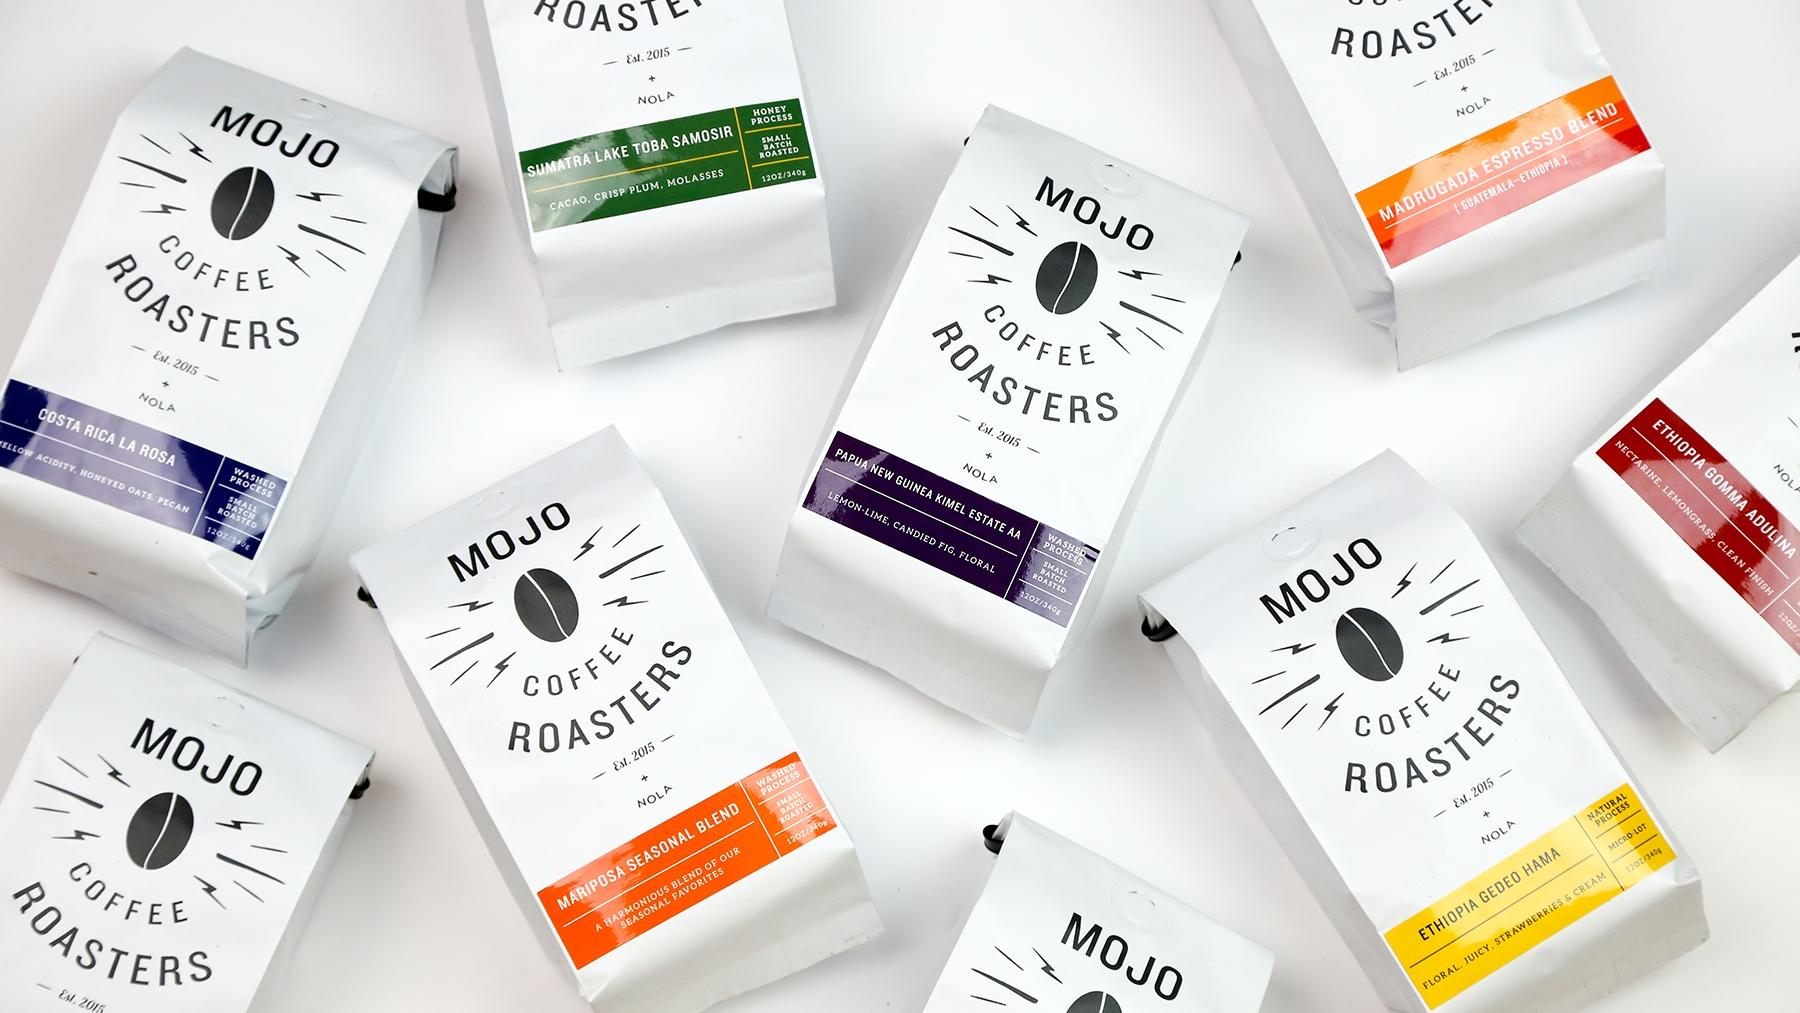 mojo-coffee-roaster-bags.jpg